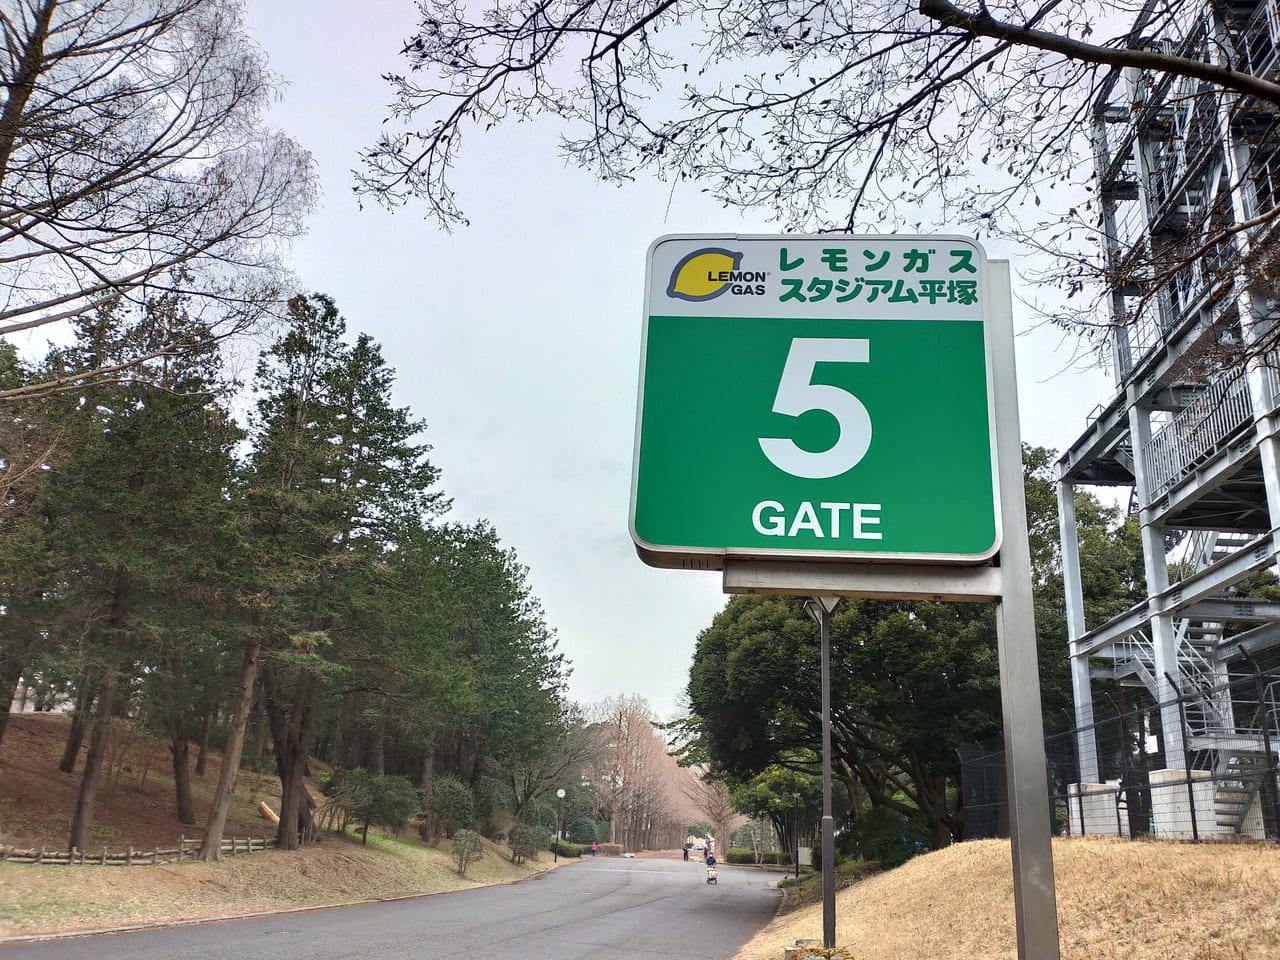 「Shonan BMW スタジアム平塚」から「レモンガススタジアム平塚」へ。2月1日(月)から名称が変更になる平塚競技場の準備が着々と進んでいます。